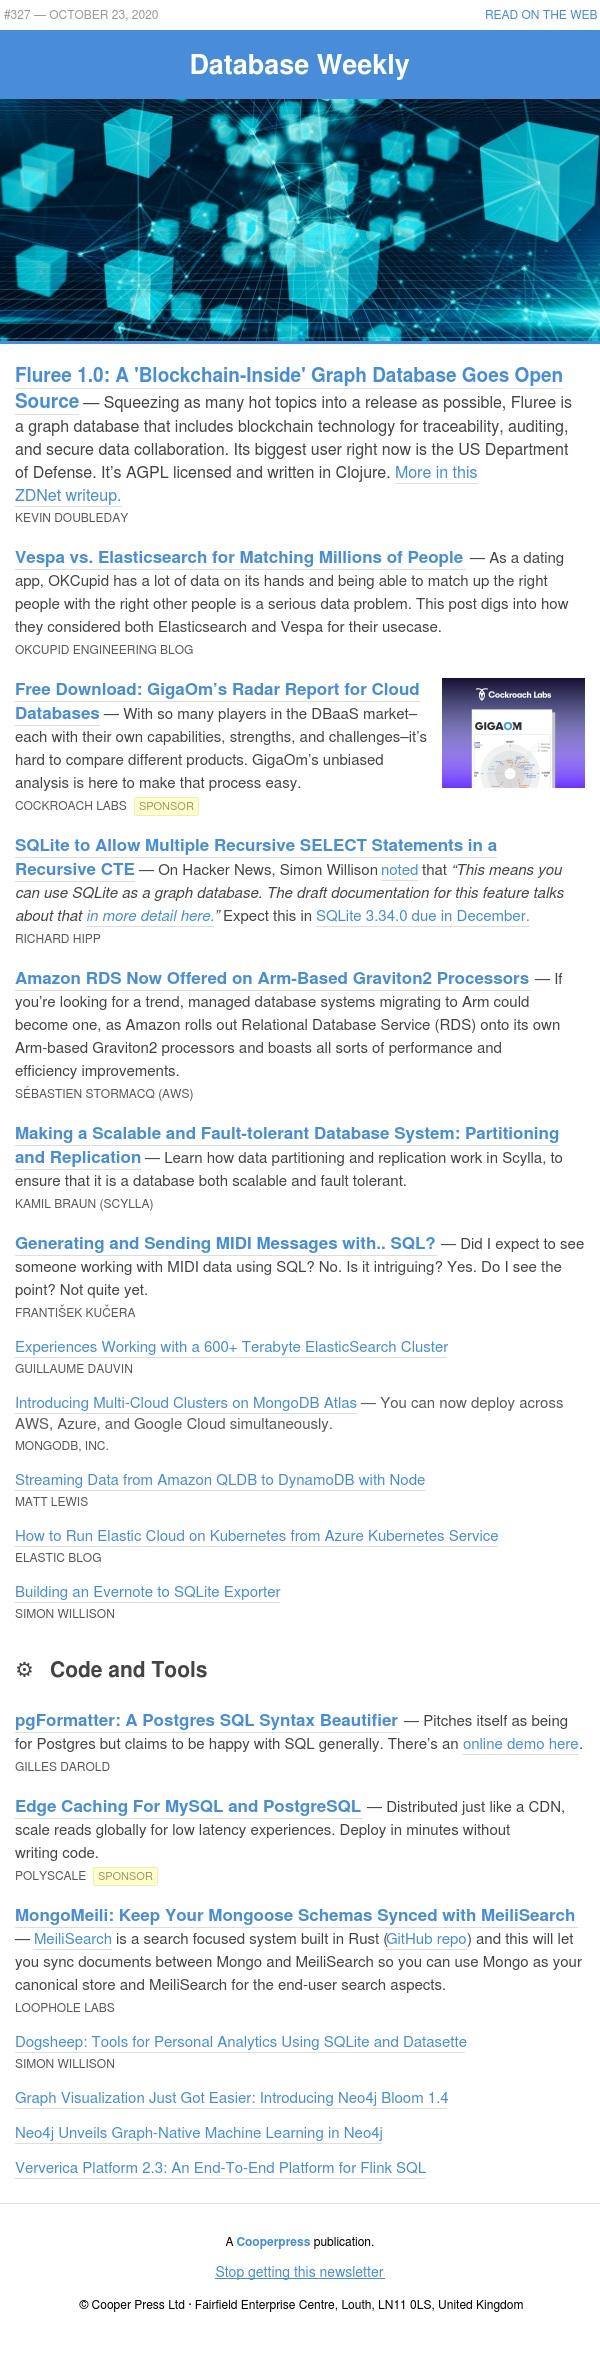 Blockchain graph databases, sending MIDI with SQL, and SQLite's graph future